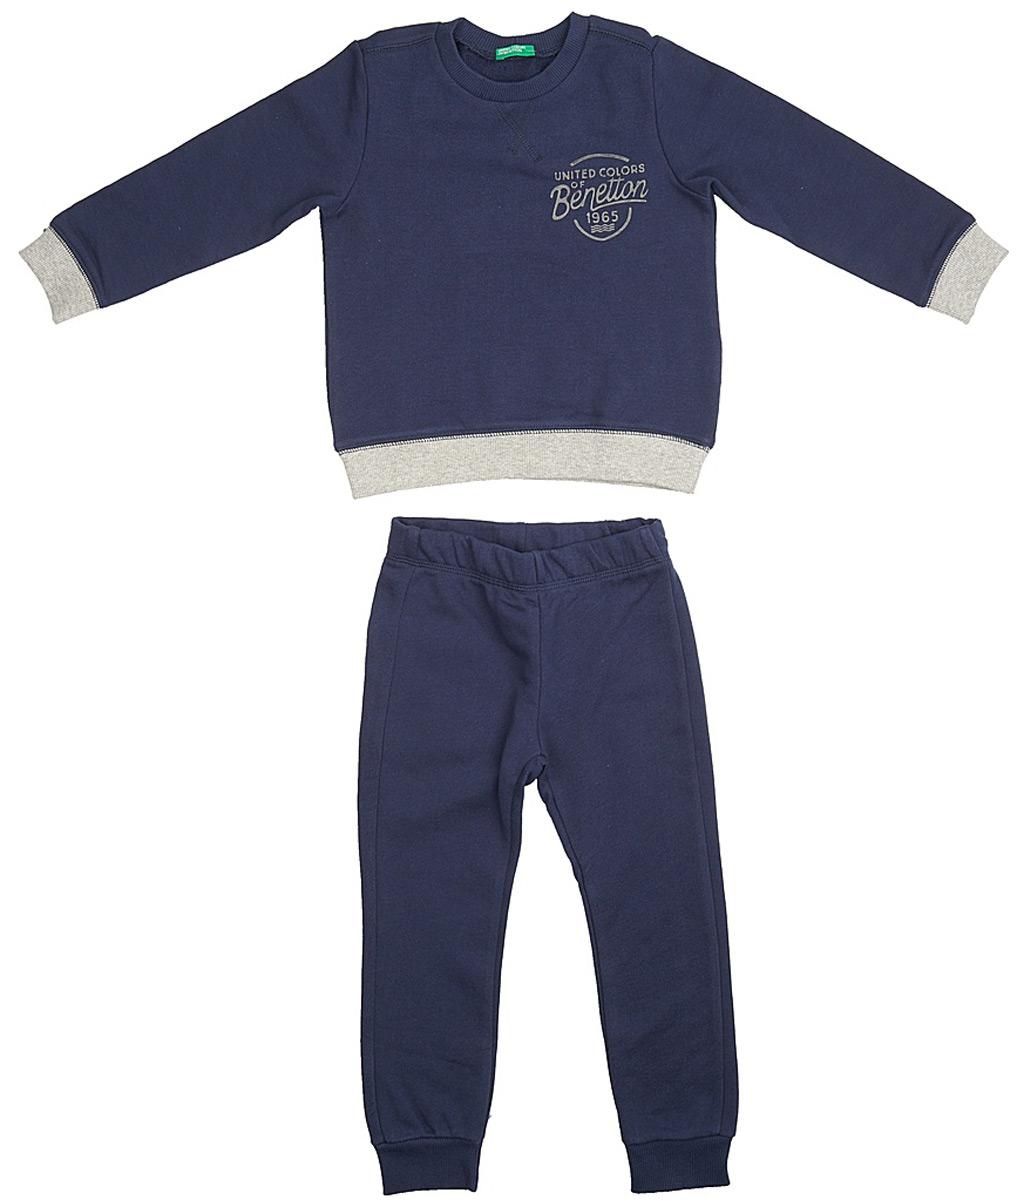 Пижама для мальчика United Colors of Benetton, цвет: синий. 3J68Z11LS_13C. Размер 100 пижама для мальчика united colors of benetton цвет серый 3j68z11ls 501 размер 100